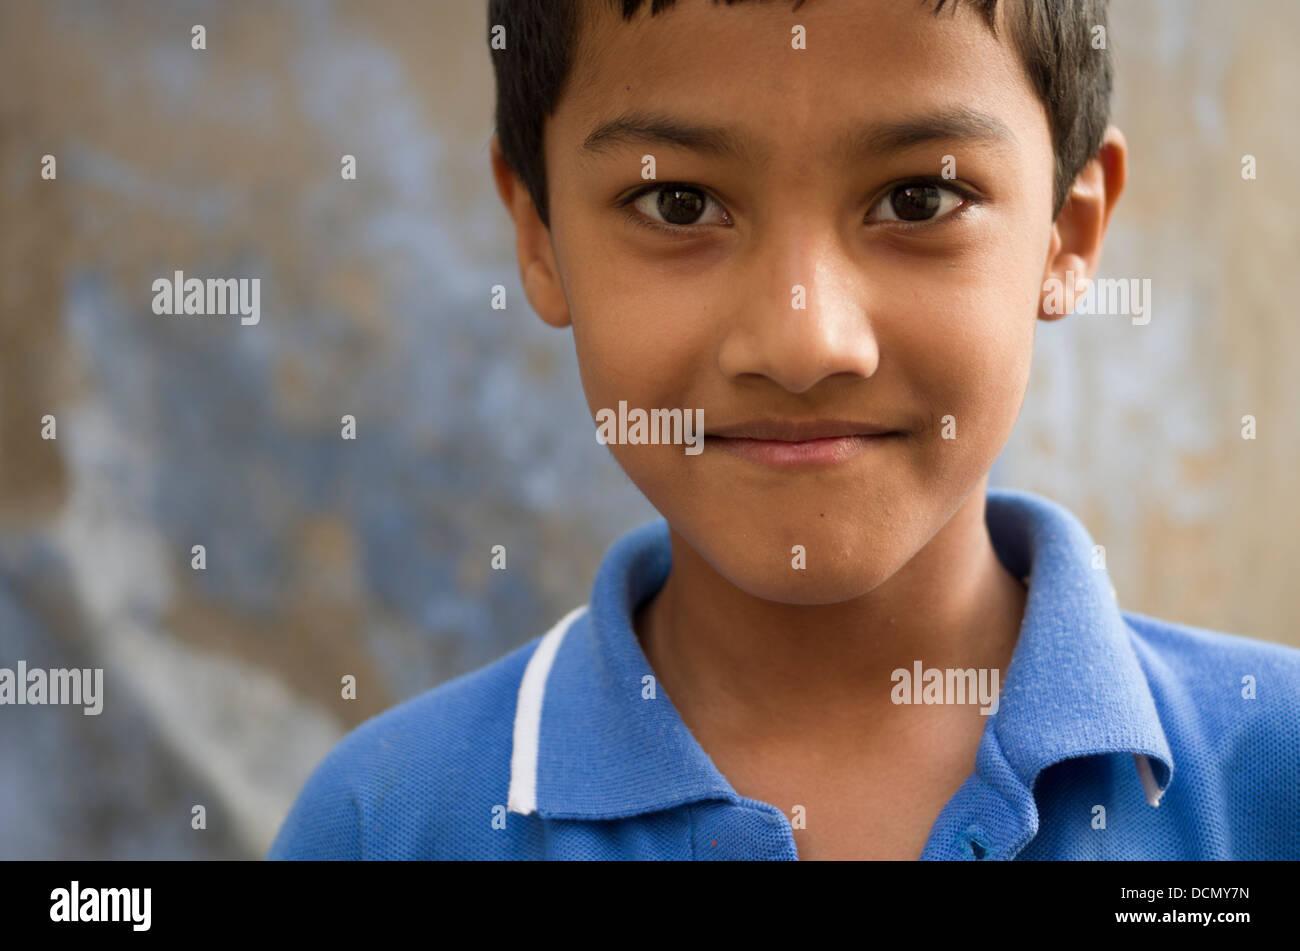 Young Indian Boy -  Jodhpur, Rajasthan, India - Stock Image